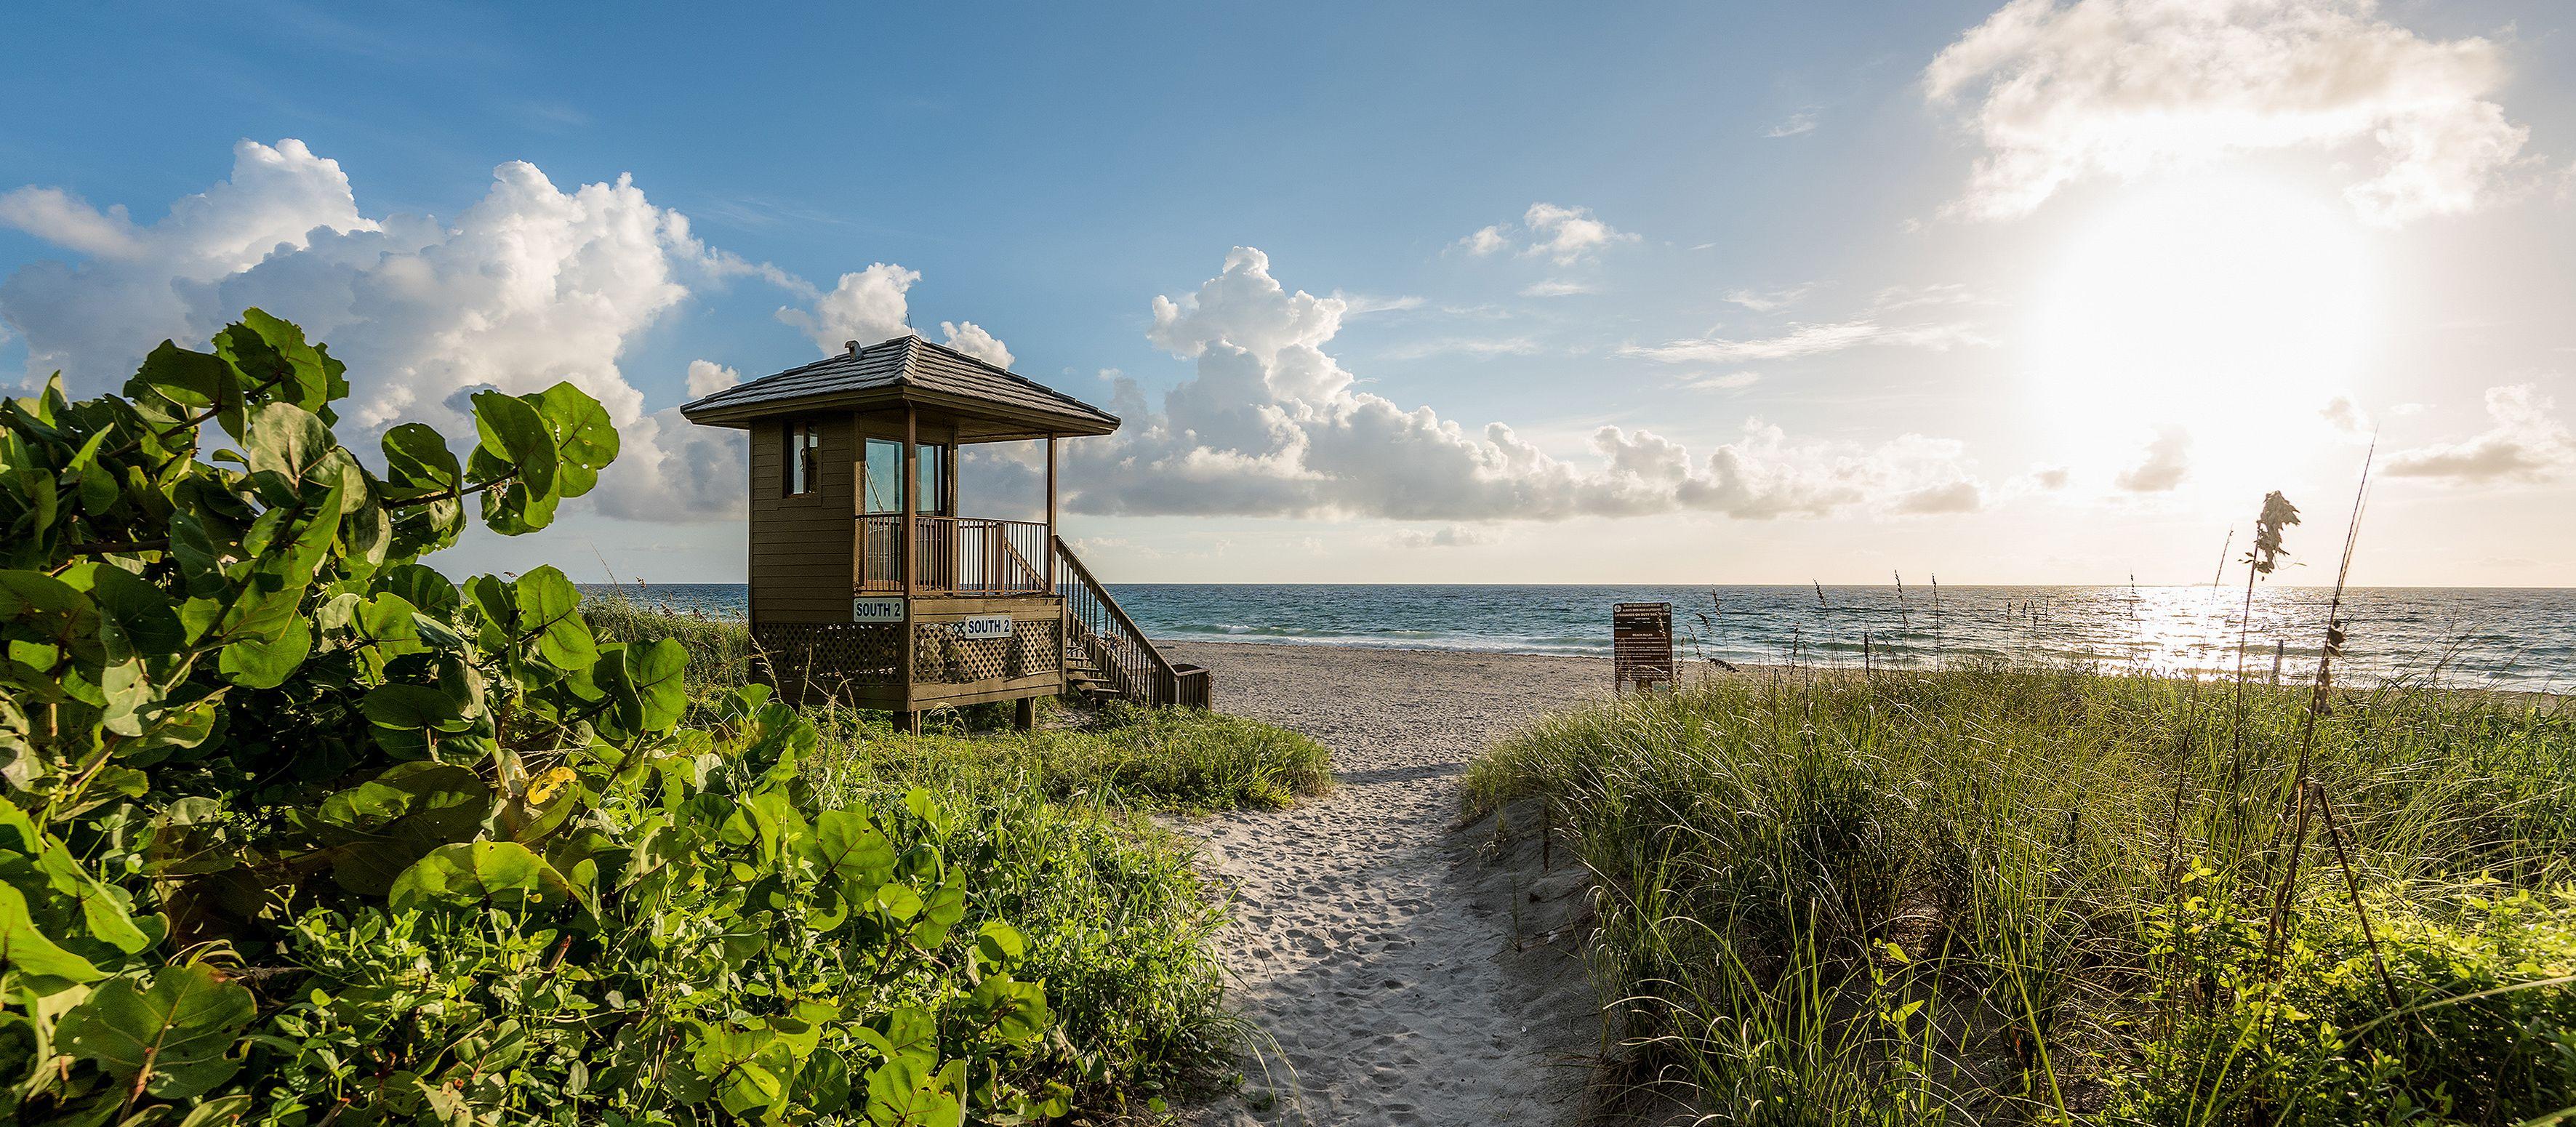 Blick auf den Delray Beach in Florida